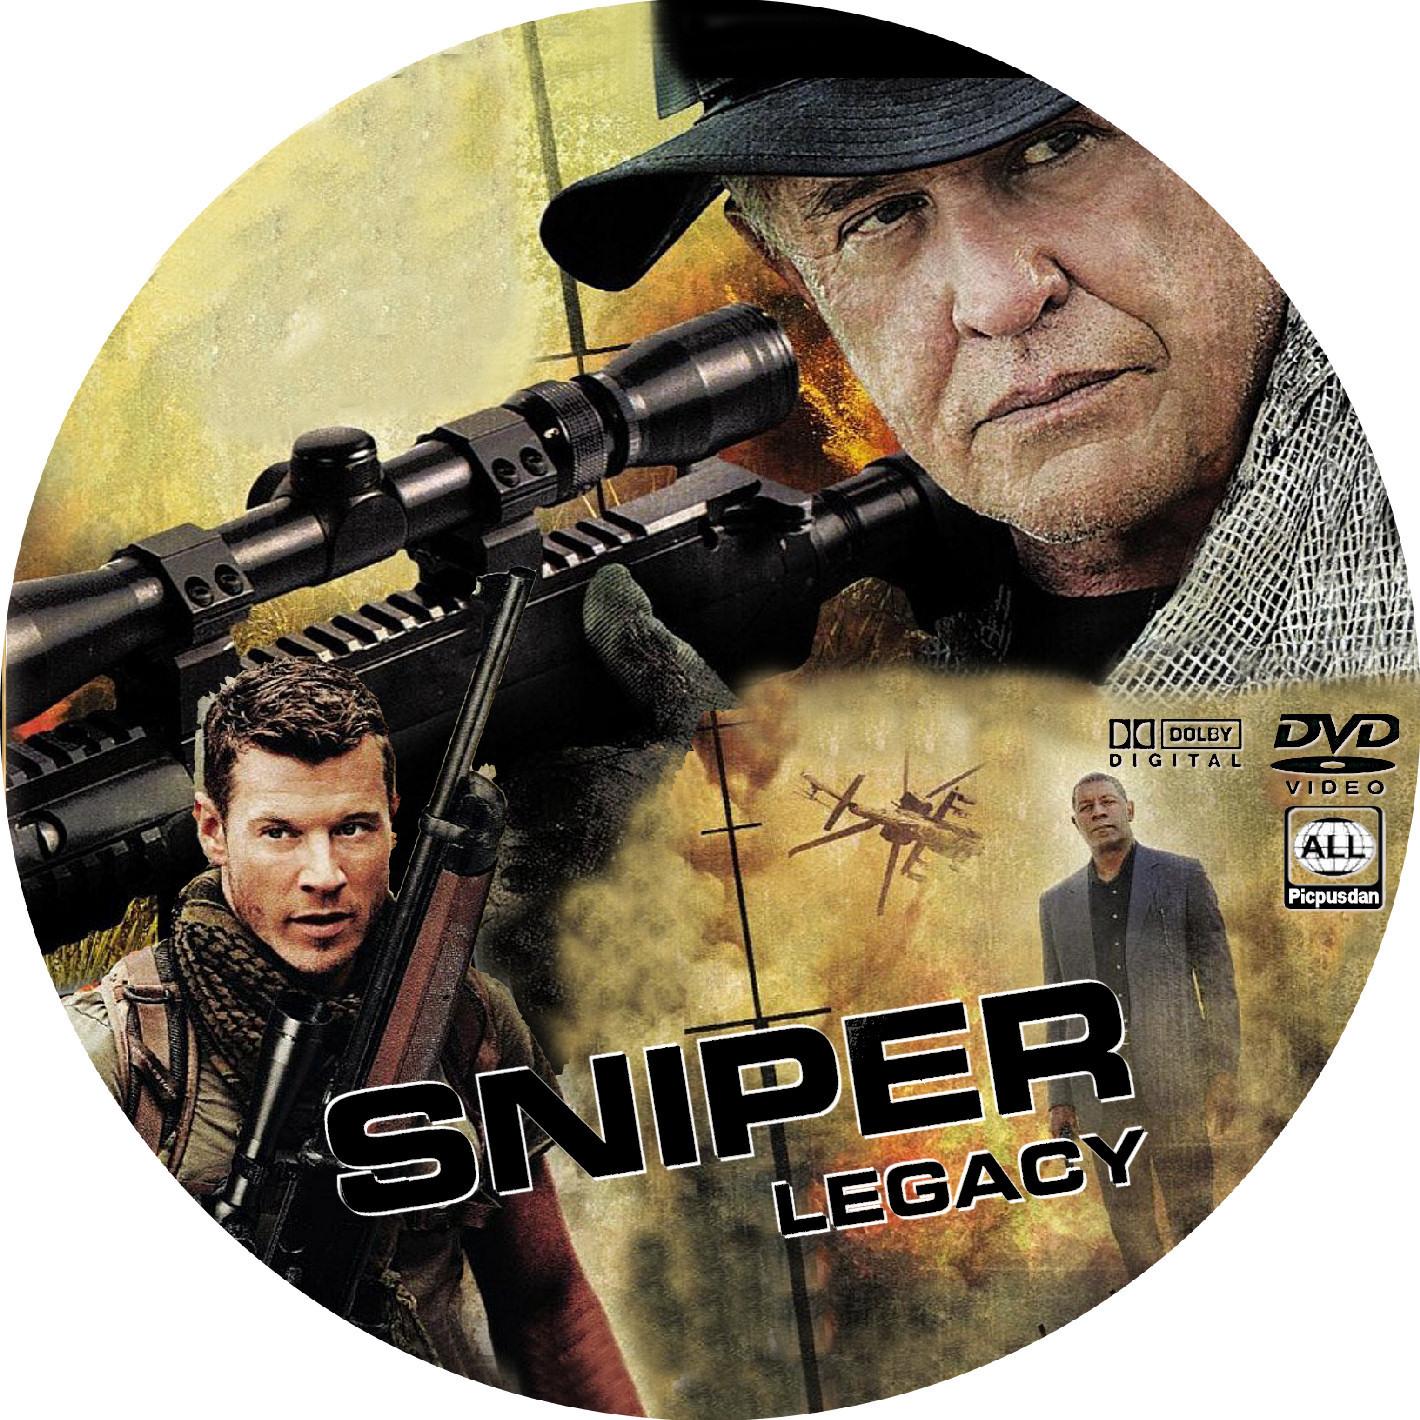 sniper legacy movie